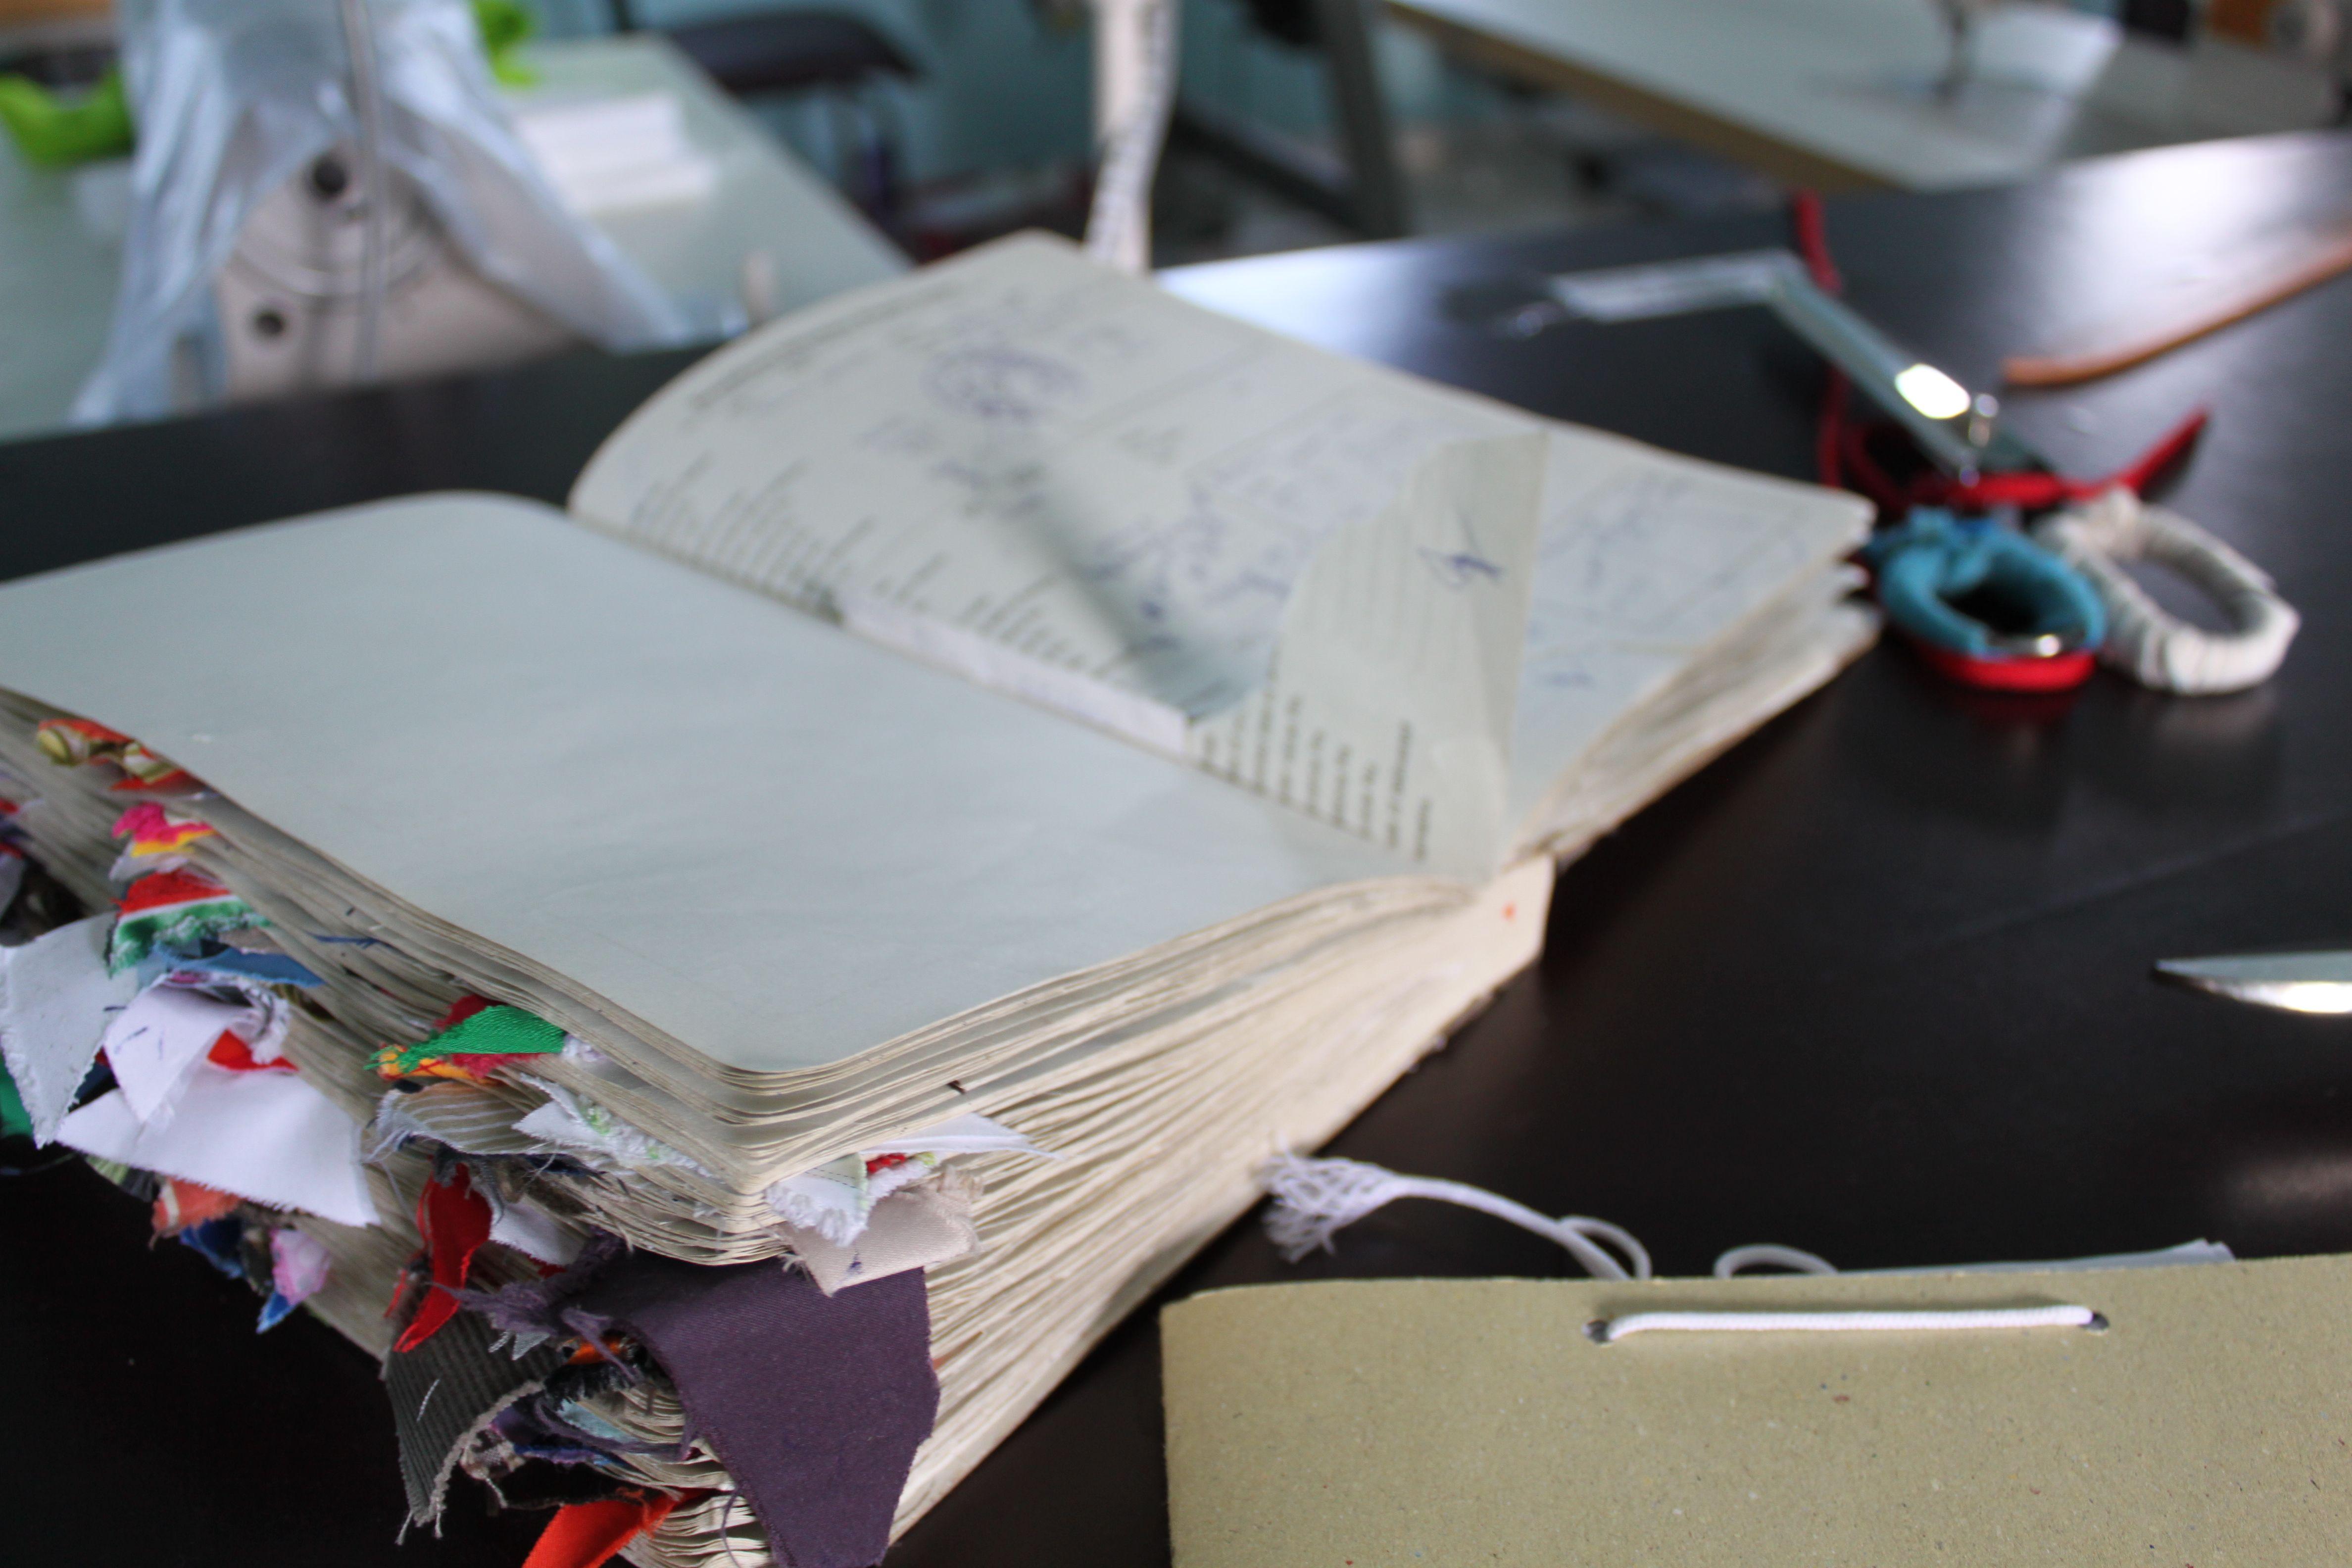 Sketchbook full of ideas and fabrics InspirationBooks DUNSTAN